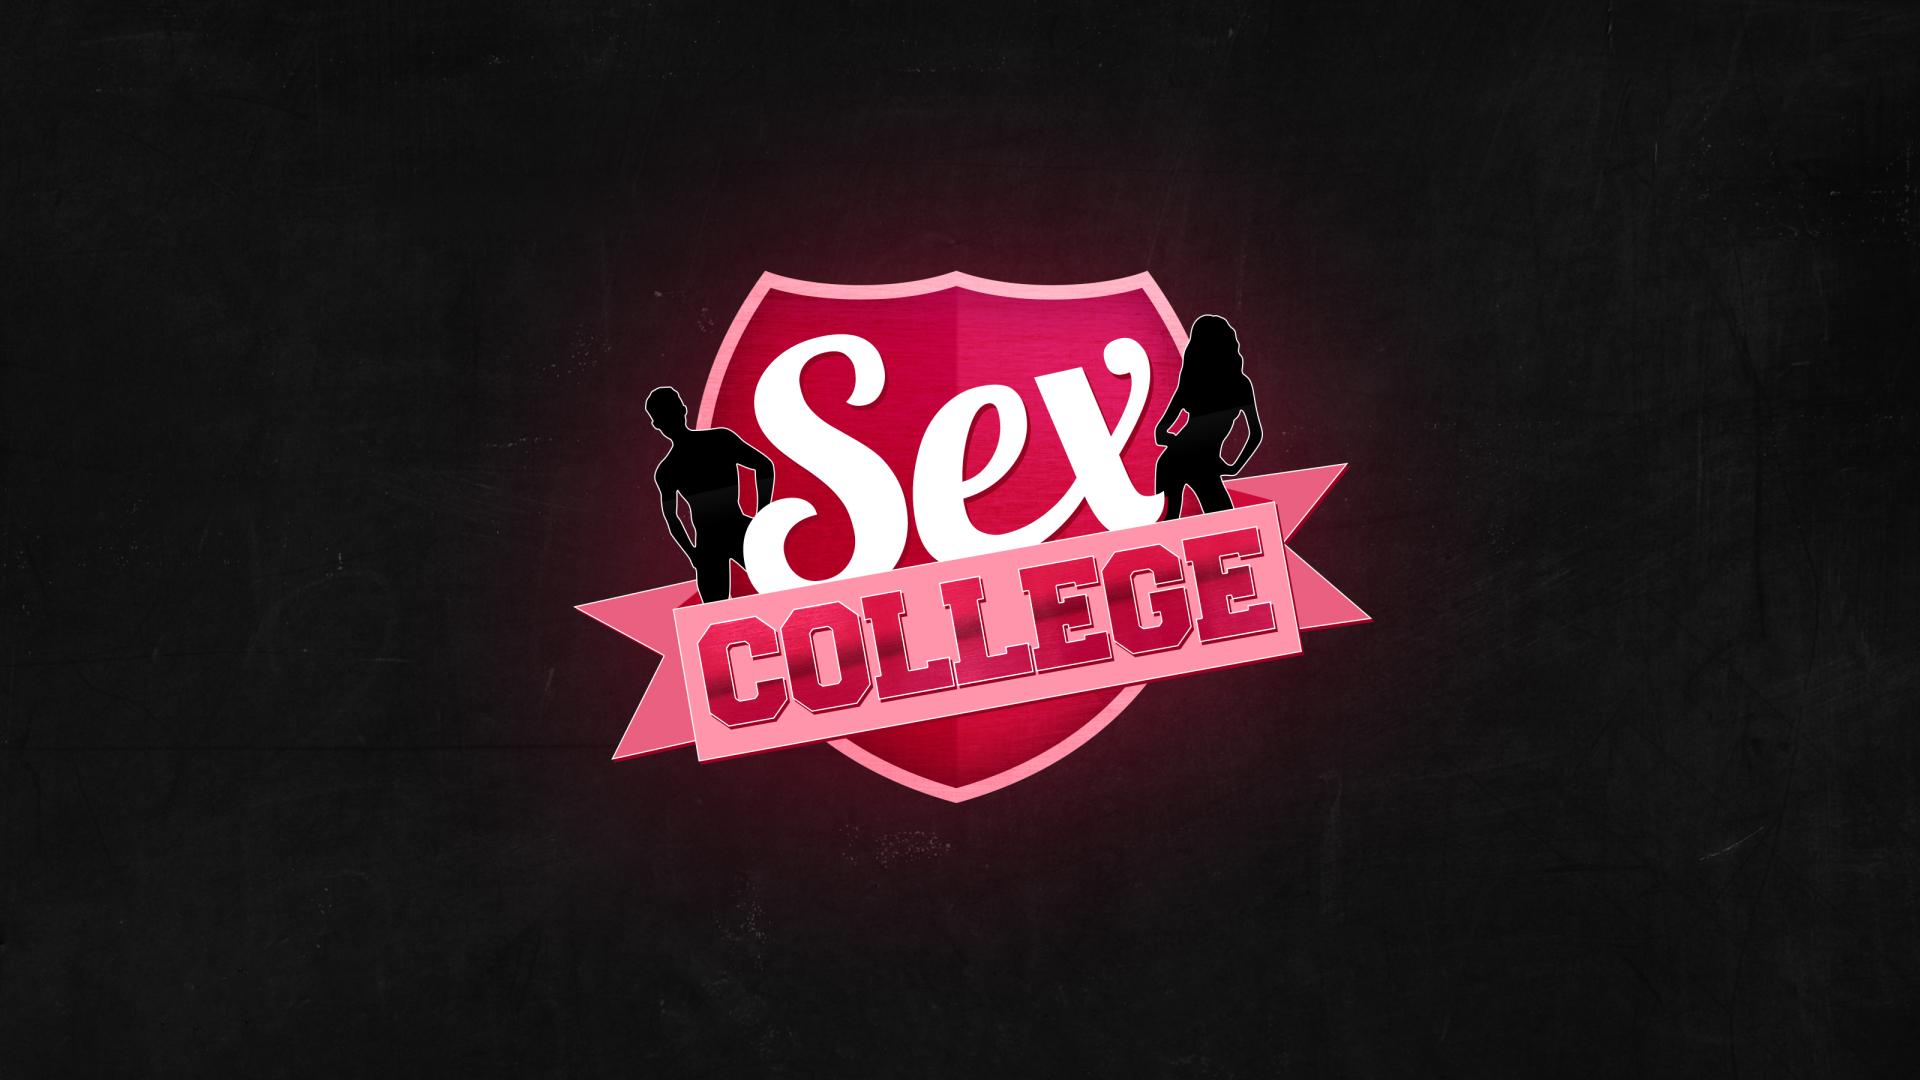 Geile foto van de hete Secret Circle seksfilm: Sex college